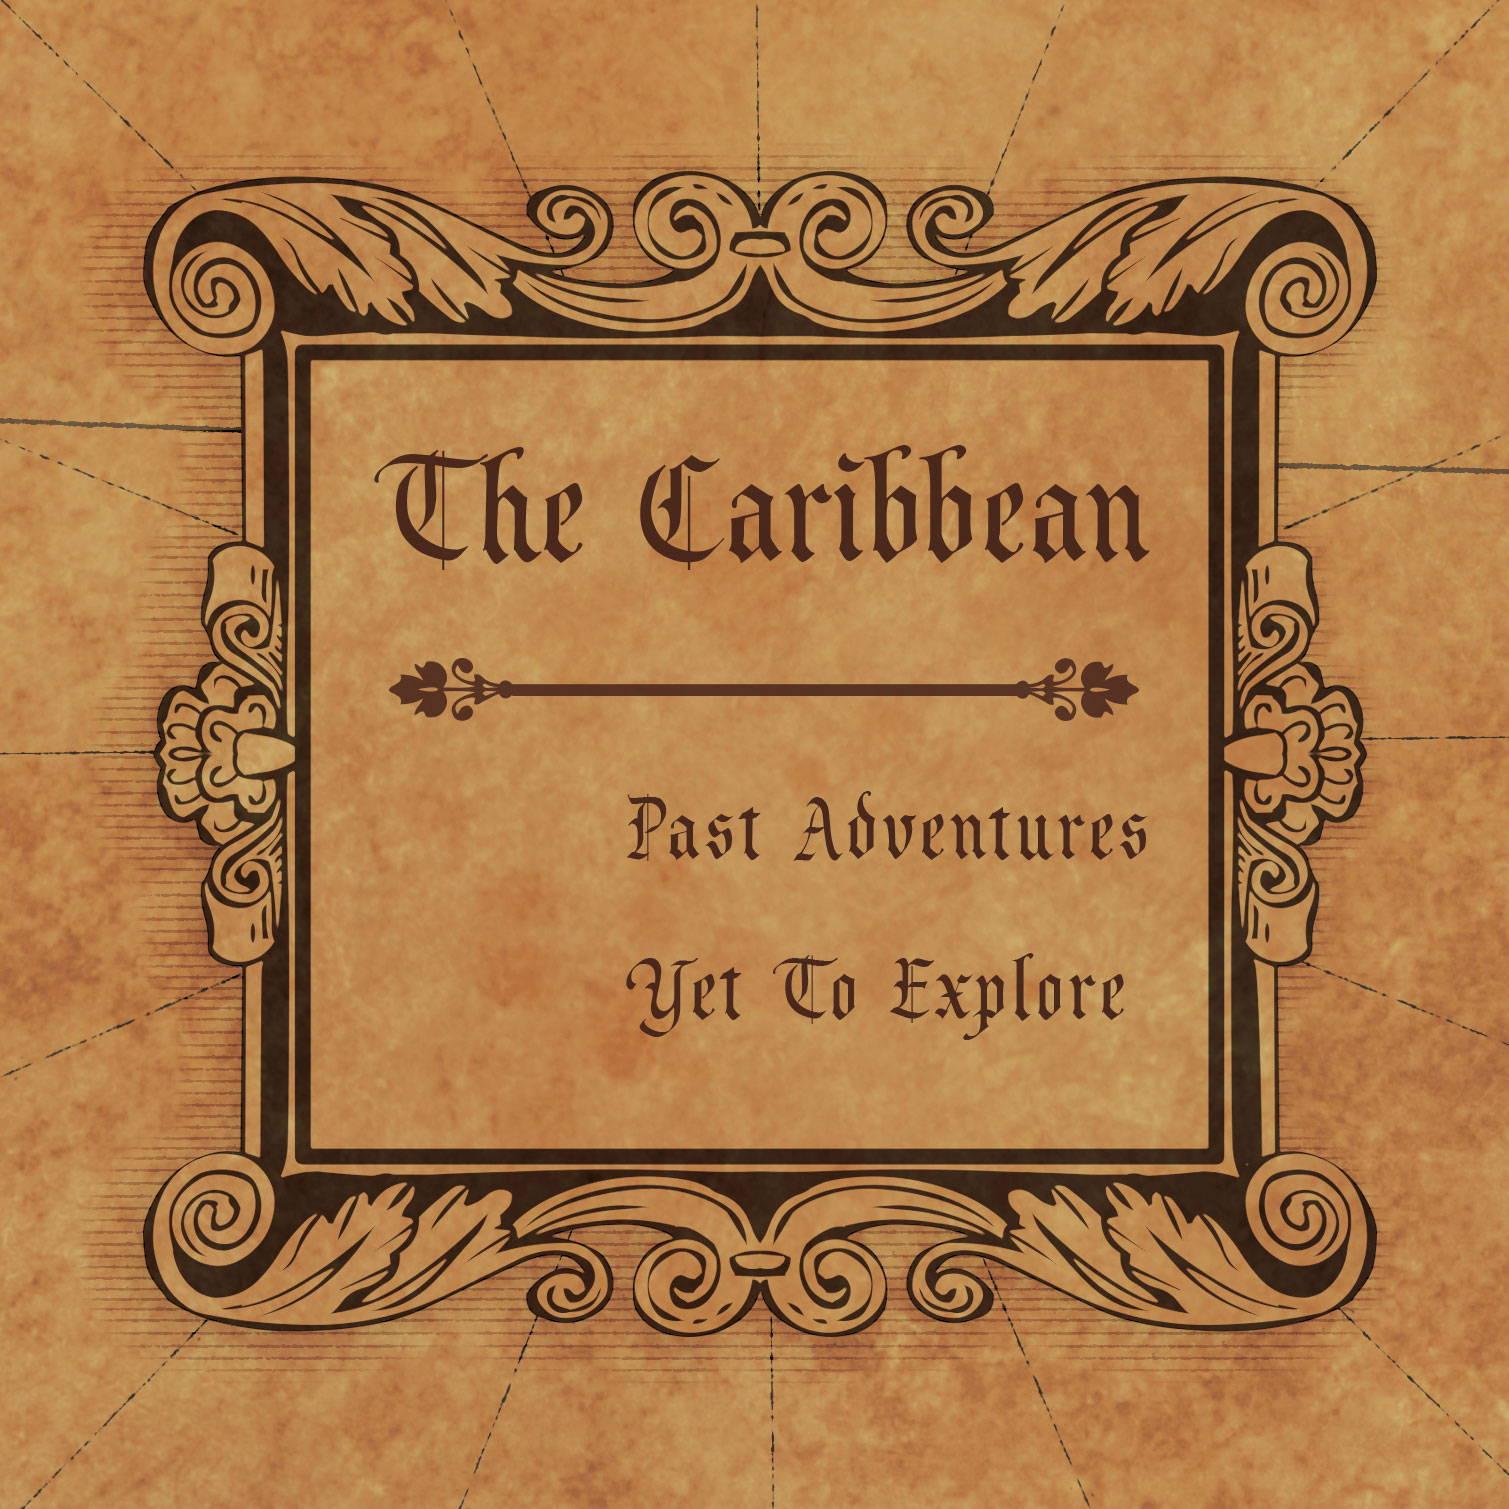 Conquest Maps Golden Aged Caribbean Legend